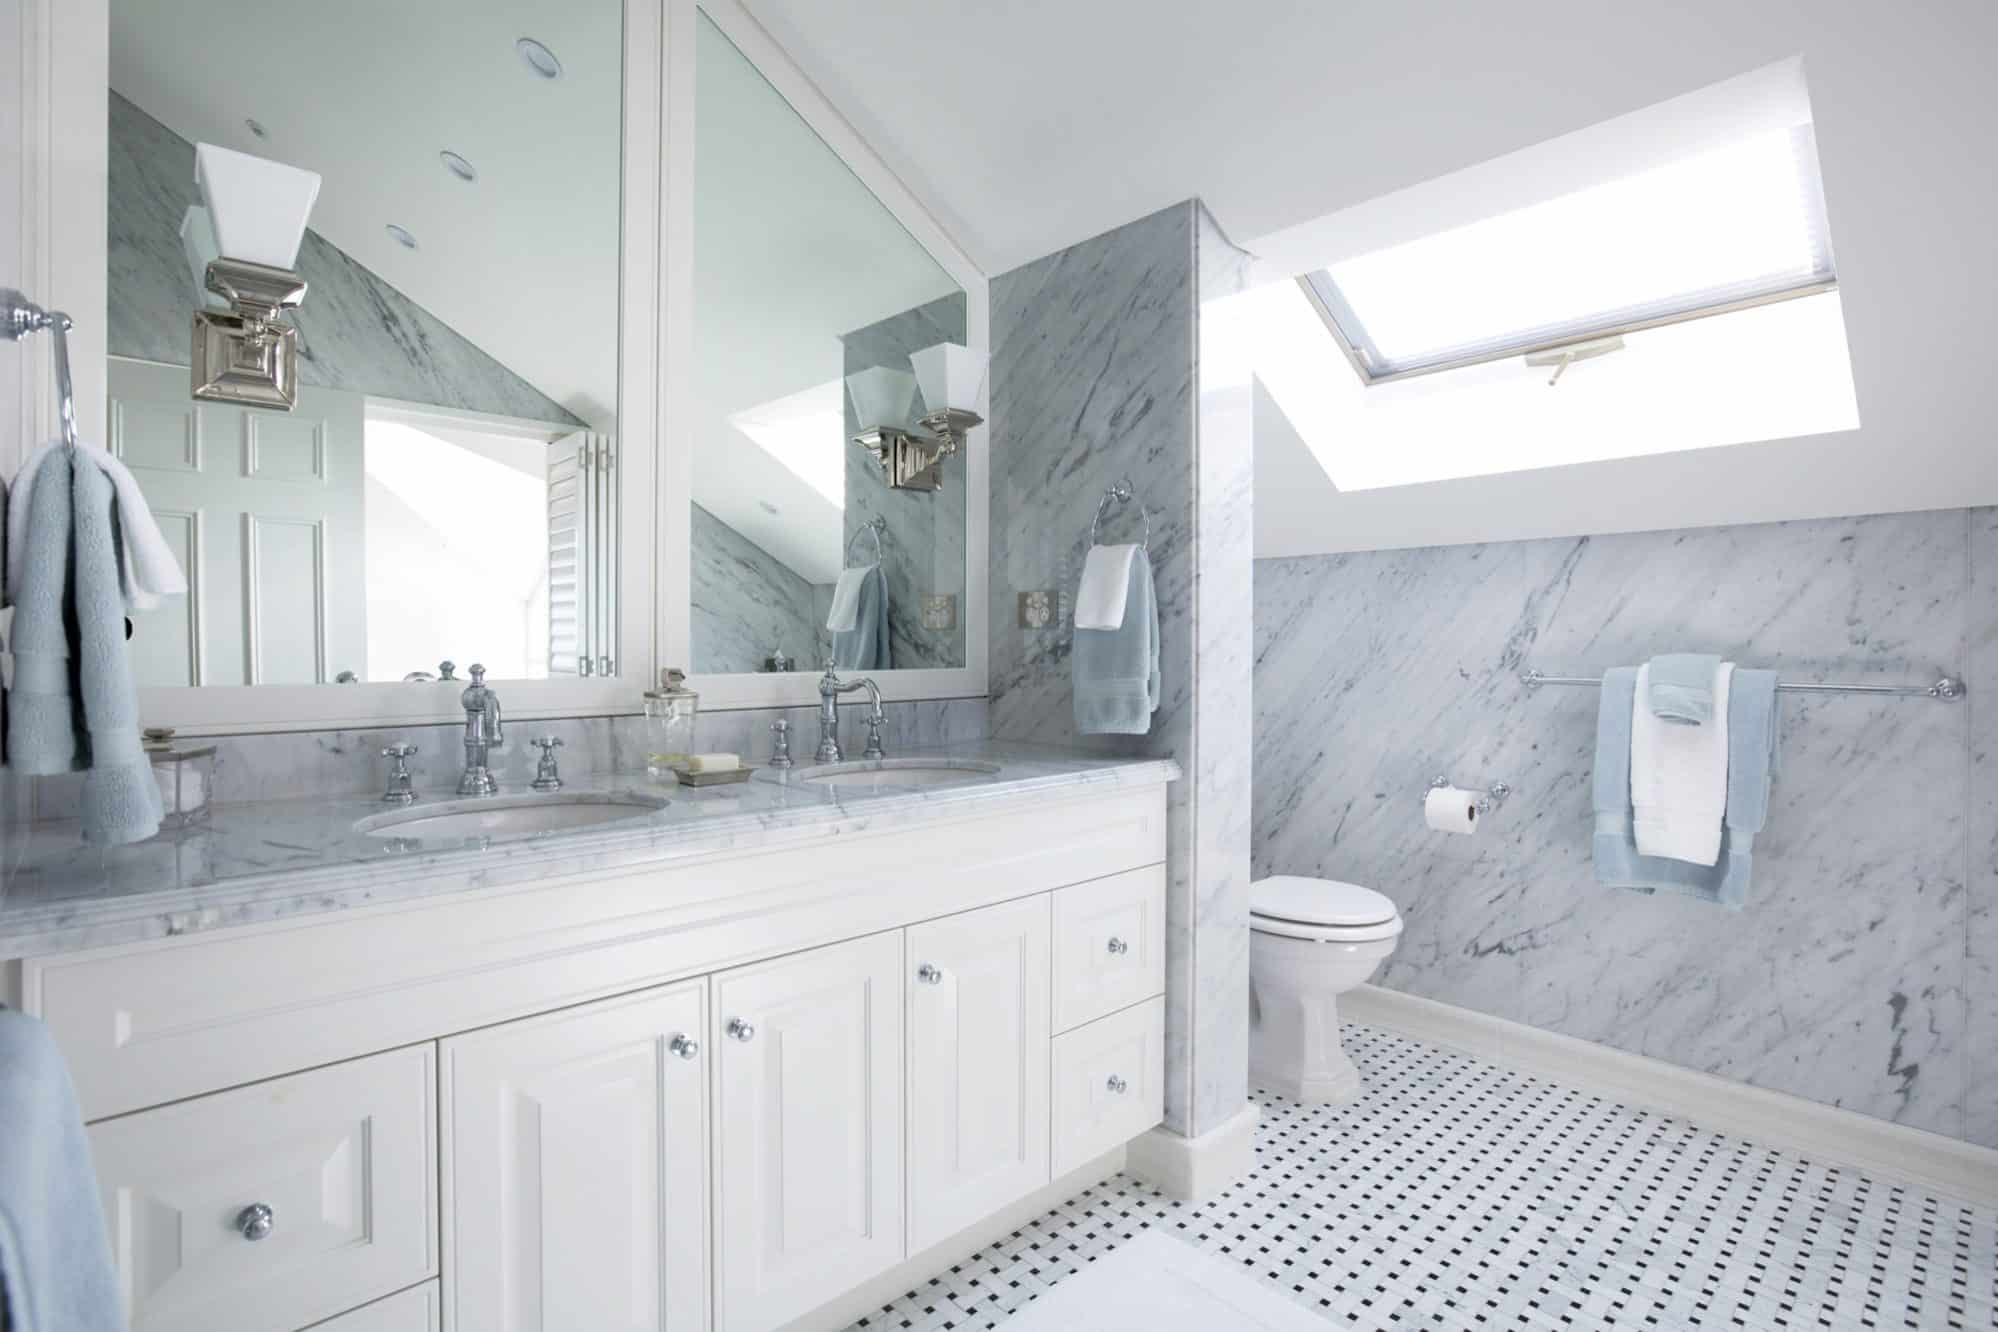 Carrara marble bathroom with art deco fittings